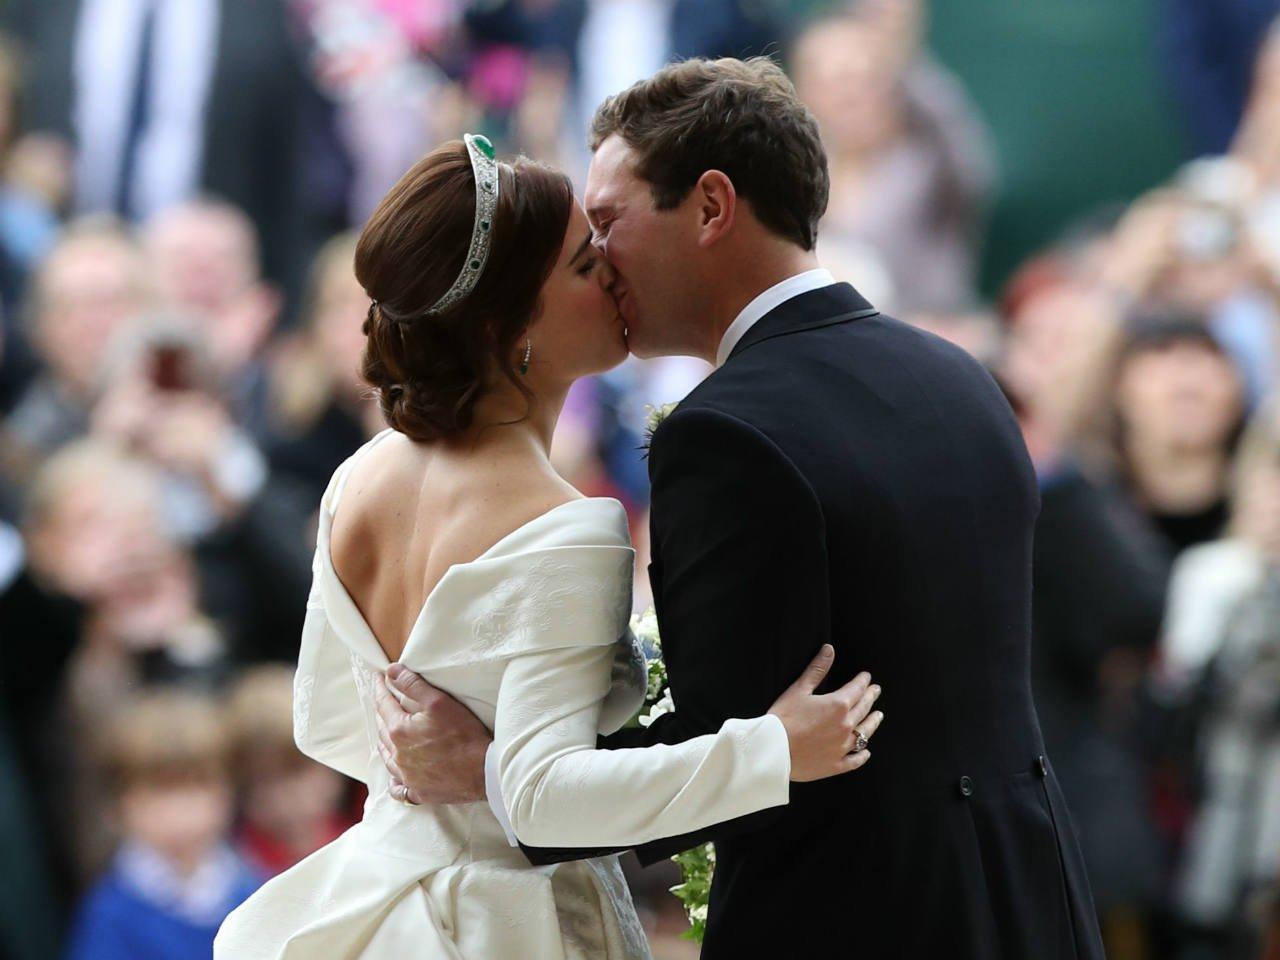 Princess Eugenie and Jack Brooksbank kiss at the royal wedding